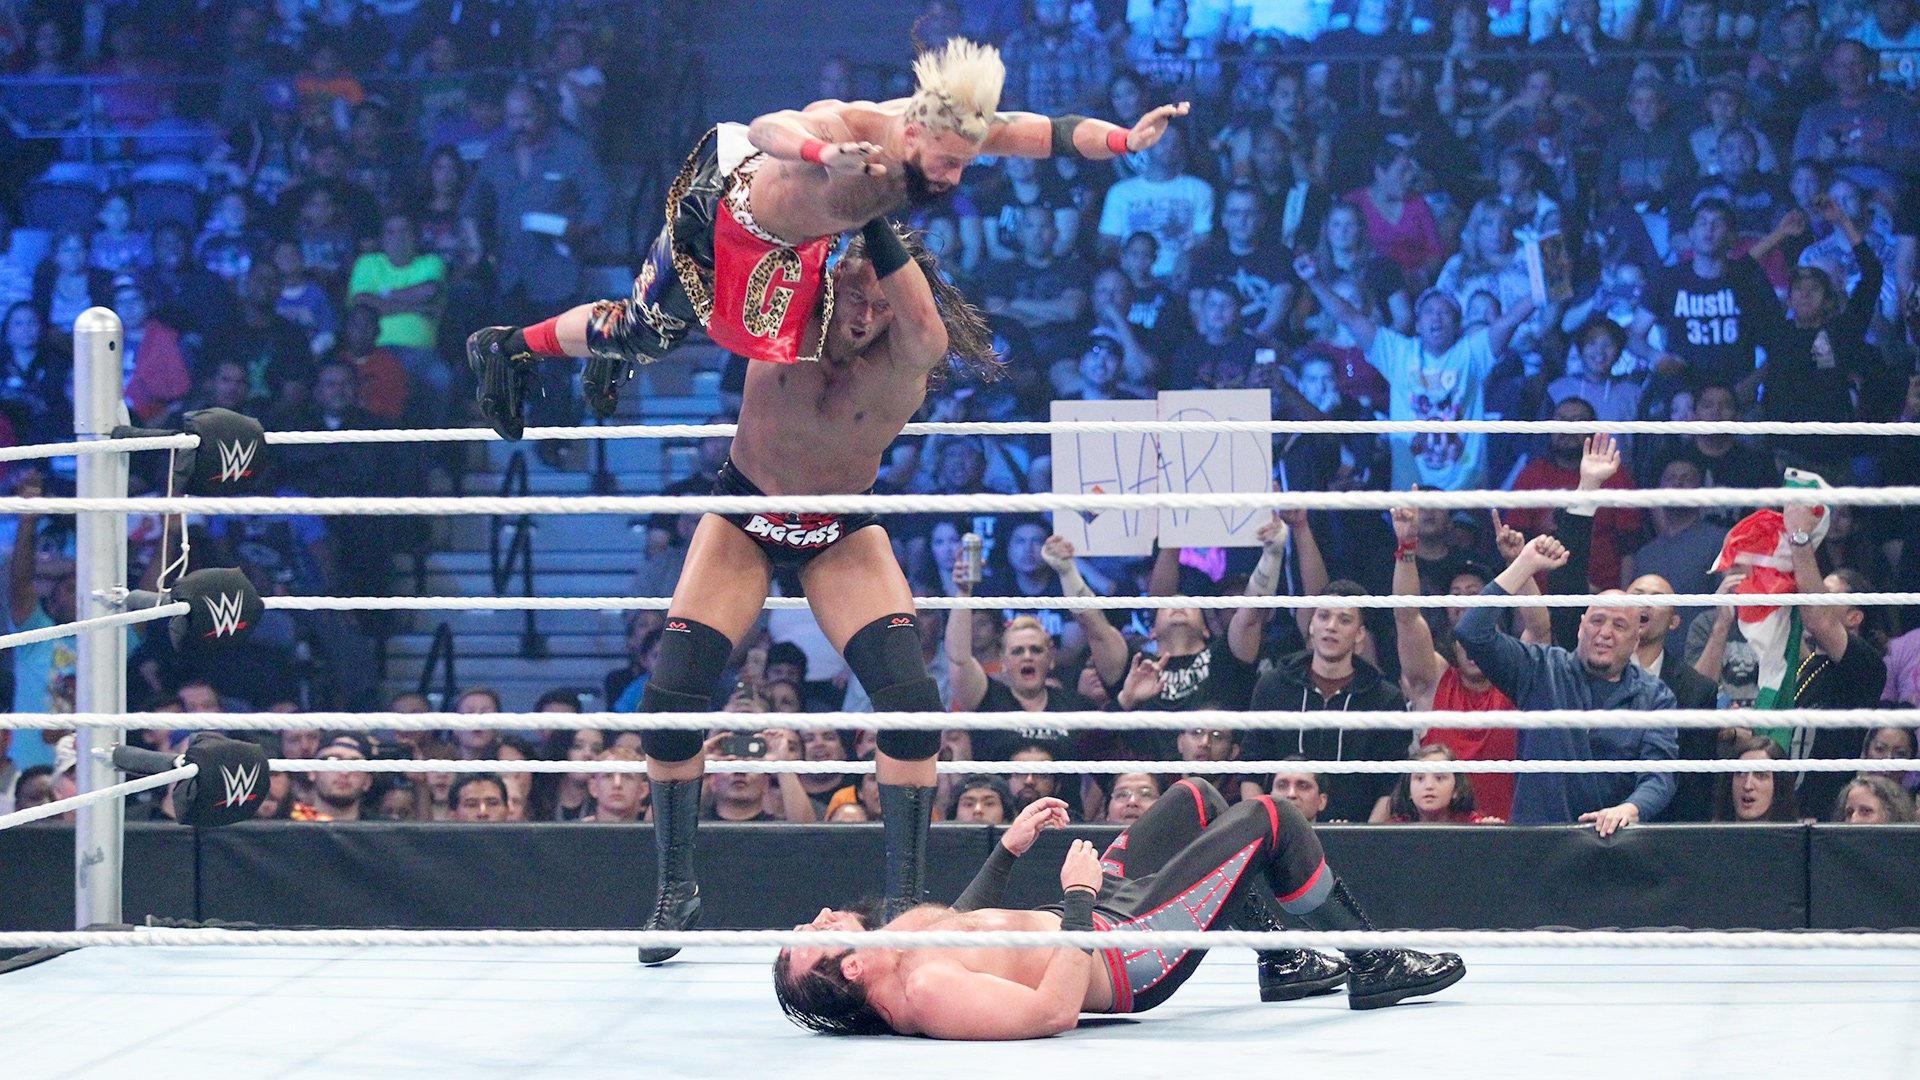 Resultats WWE SD 14 avril